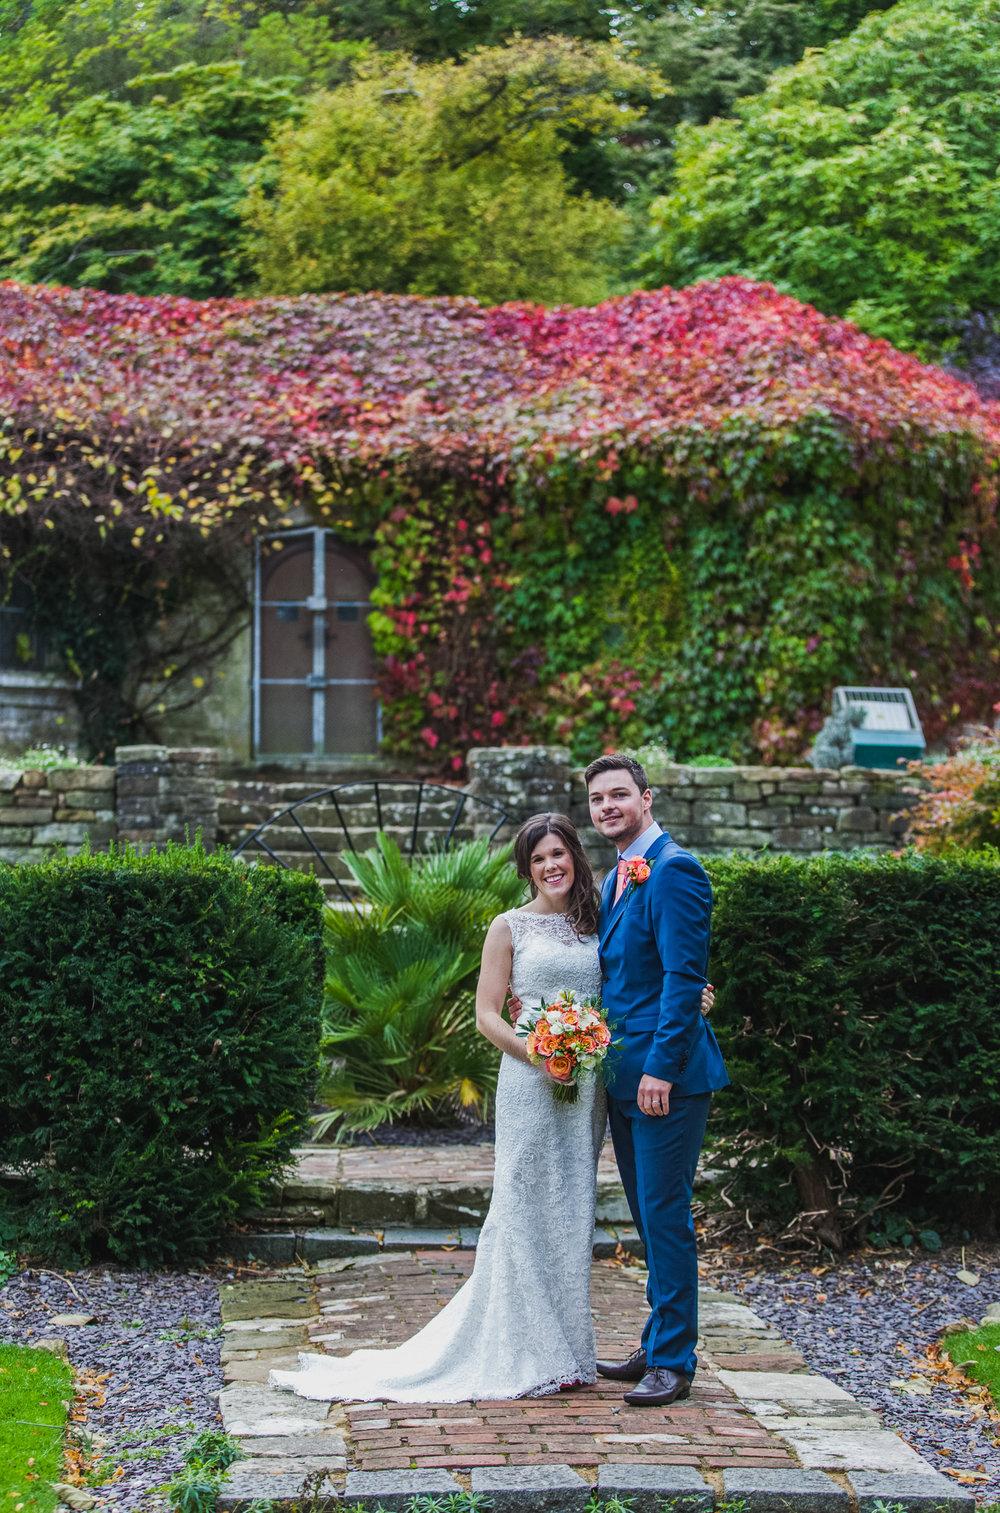 sussex wedding photographer, hayley rose photography, alternative, reportage wedding-10.jpg